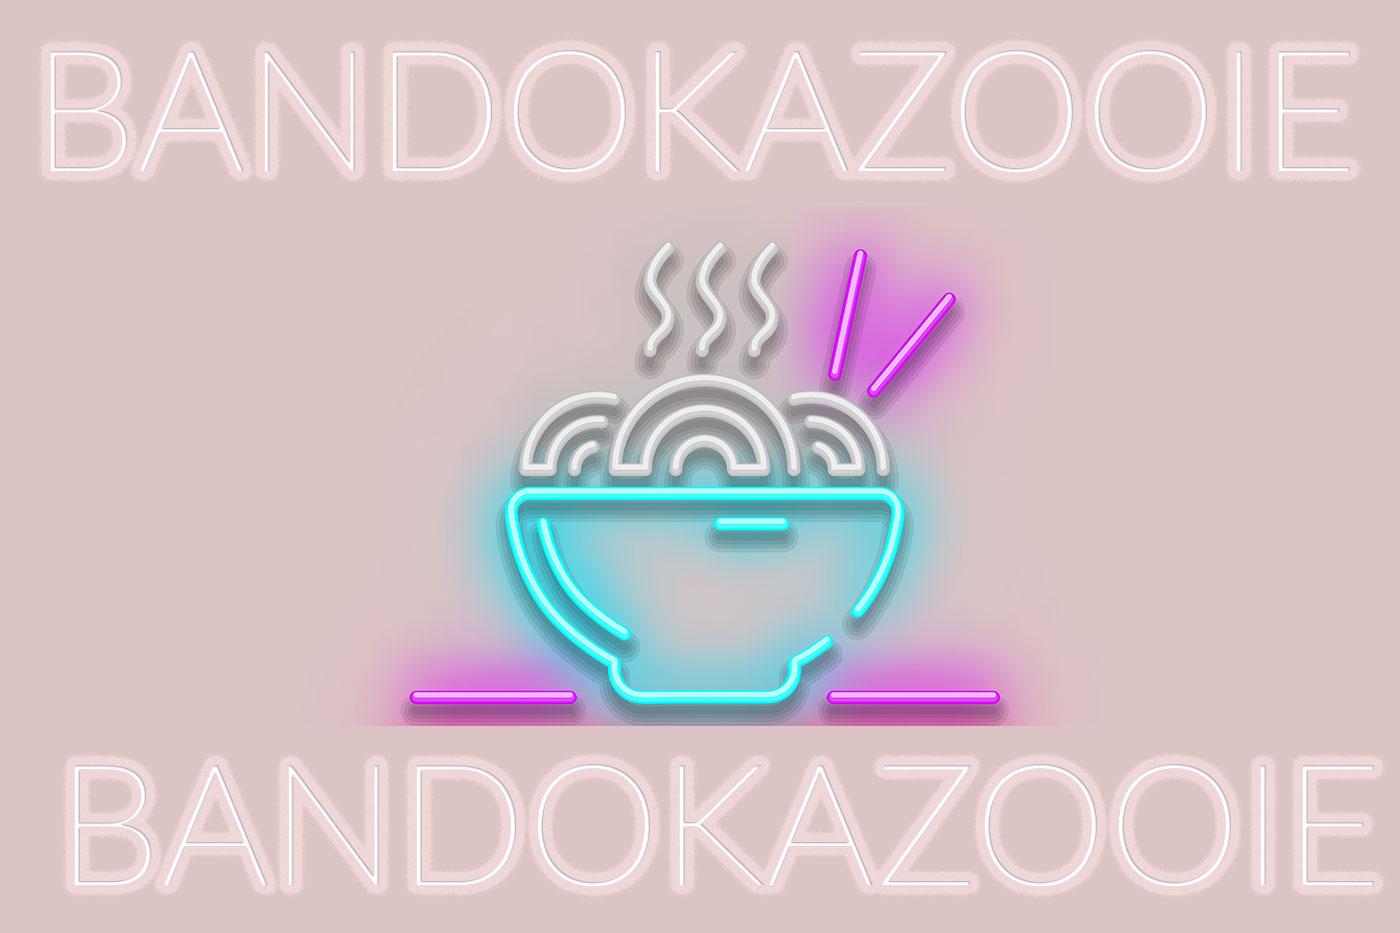 Track: Bandokazooie- 135 BPM